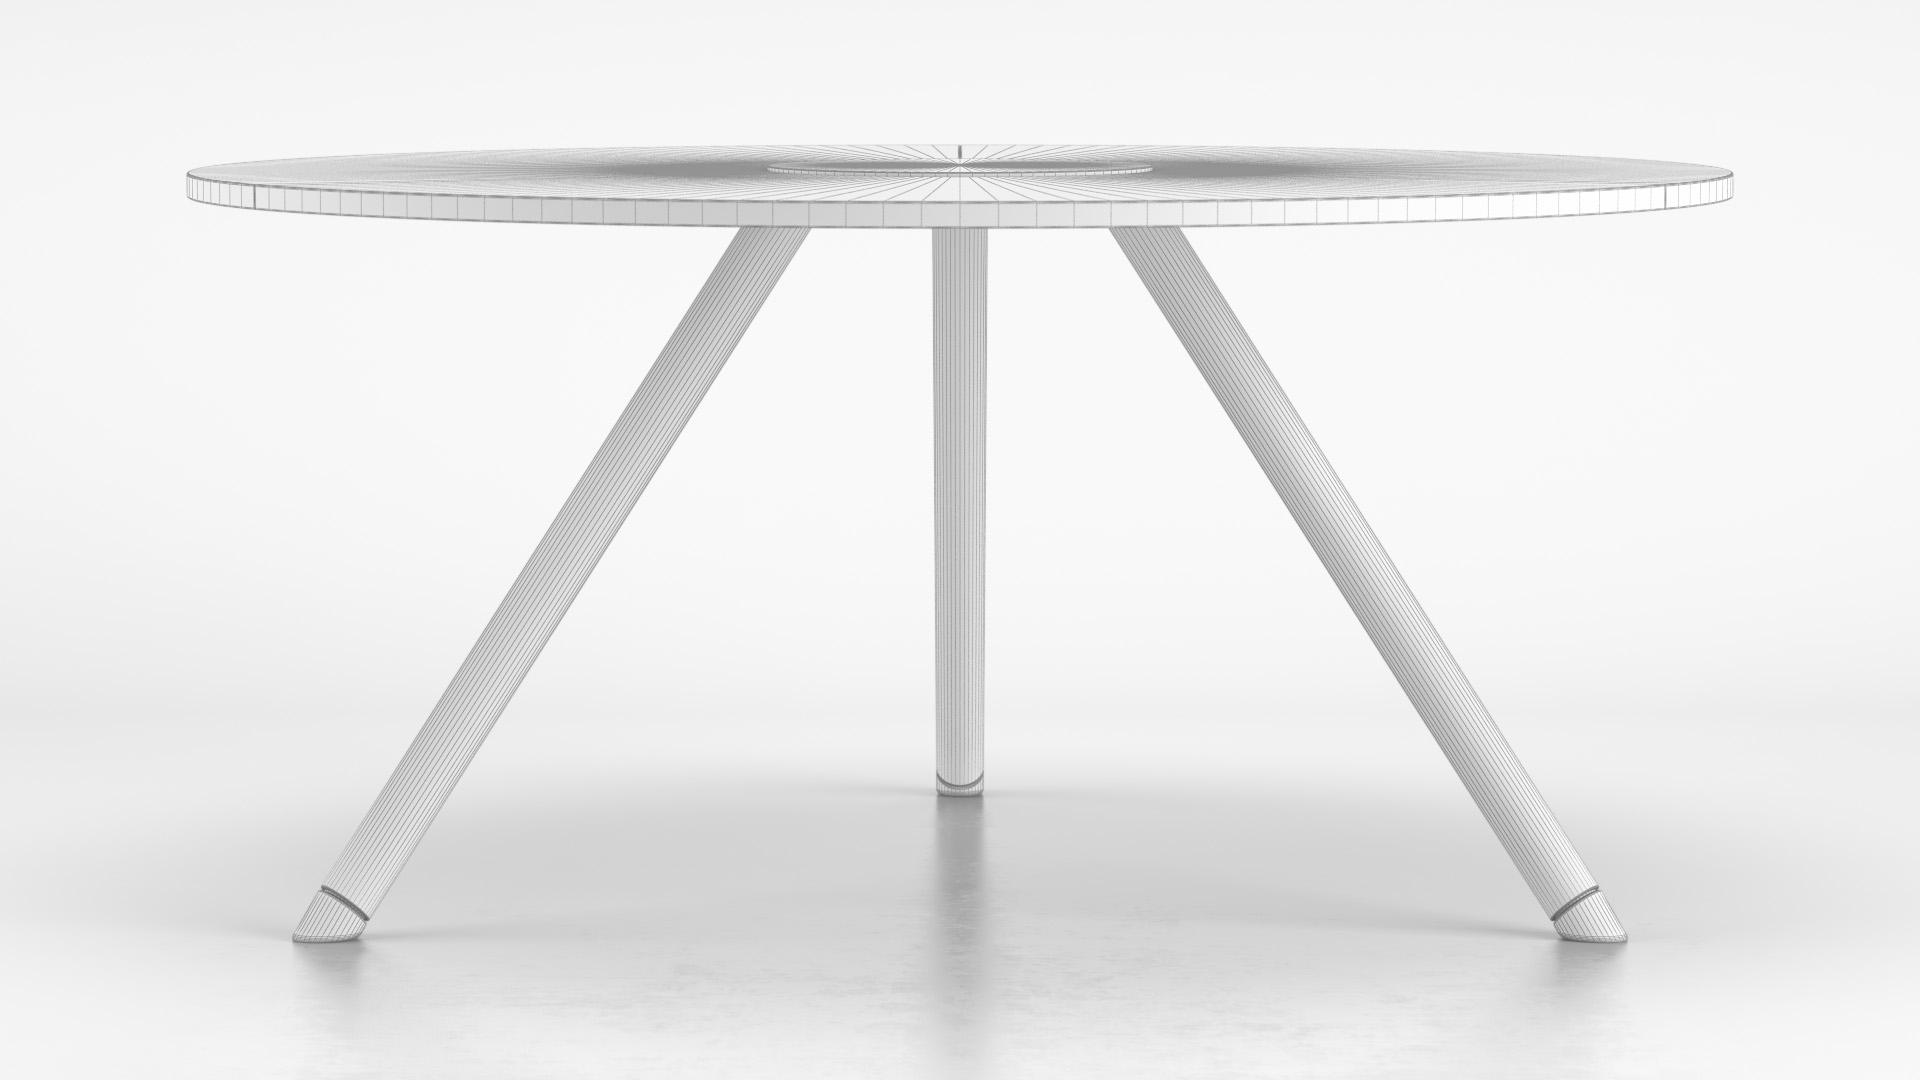 Zenith_Table_WhiteSet_01_wire_0001